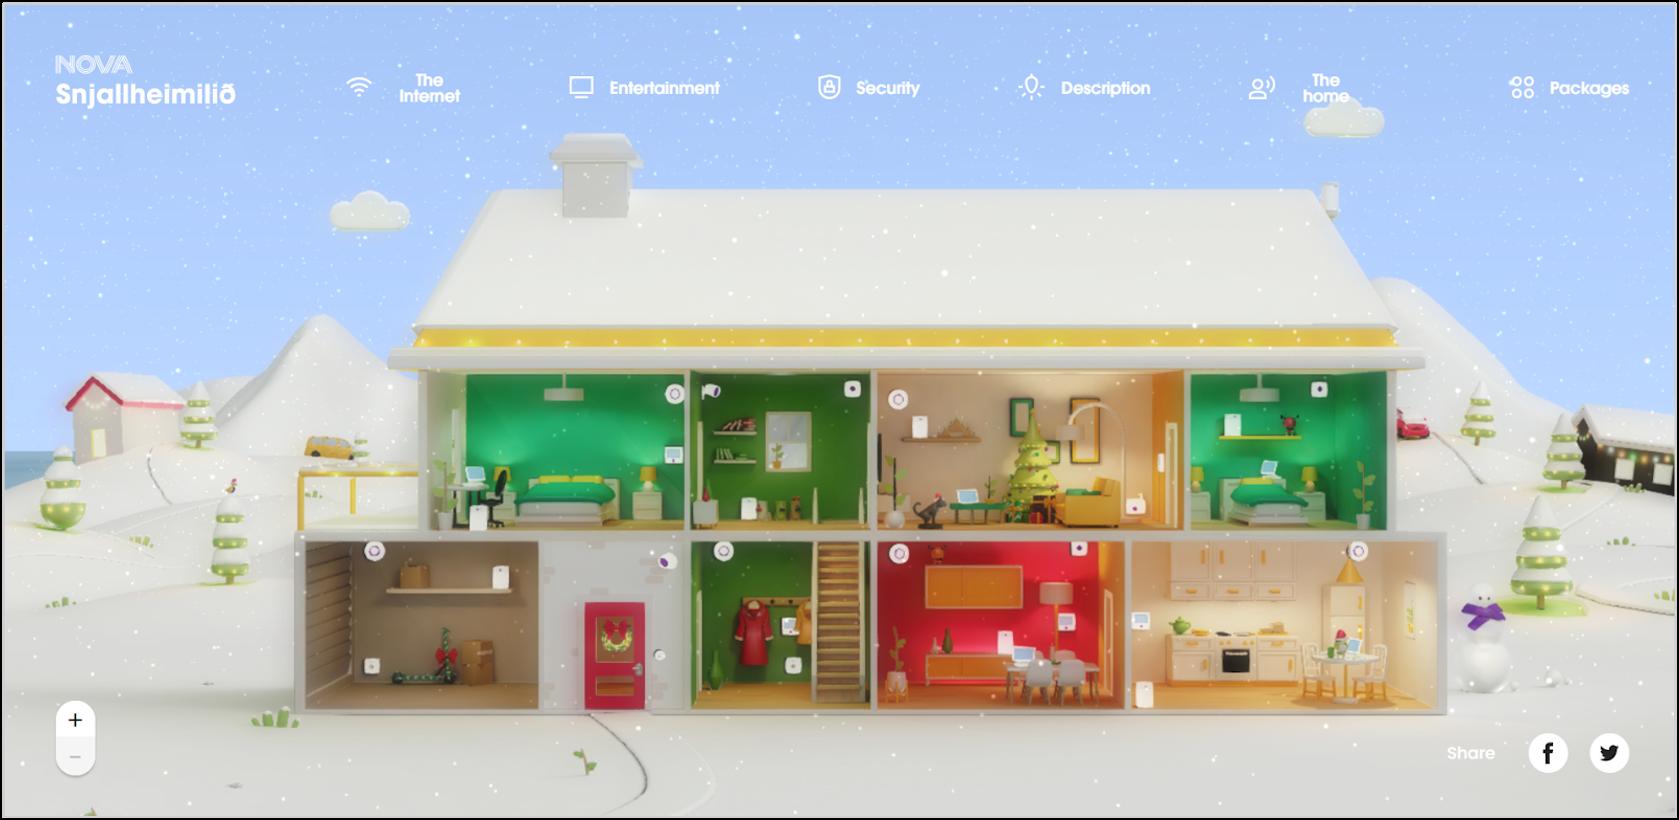 homepage of NOVA